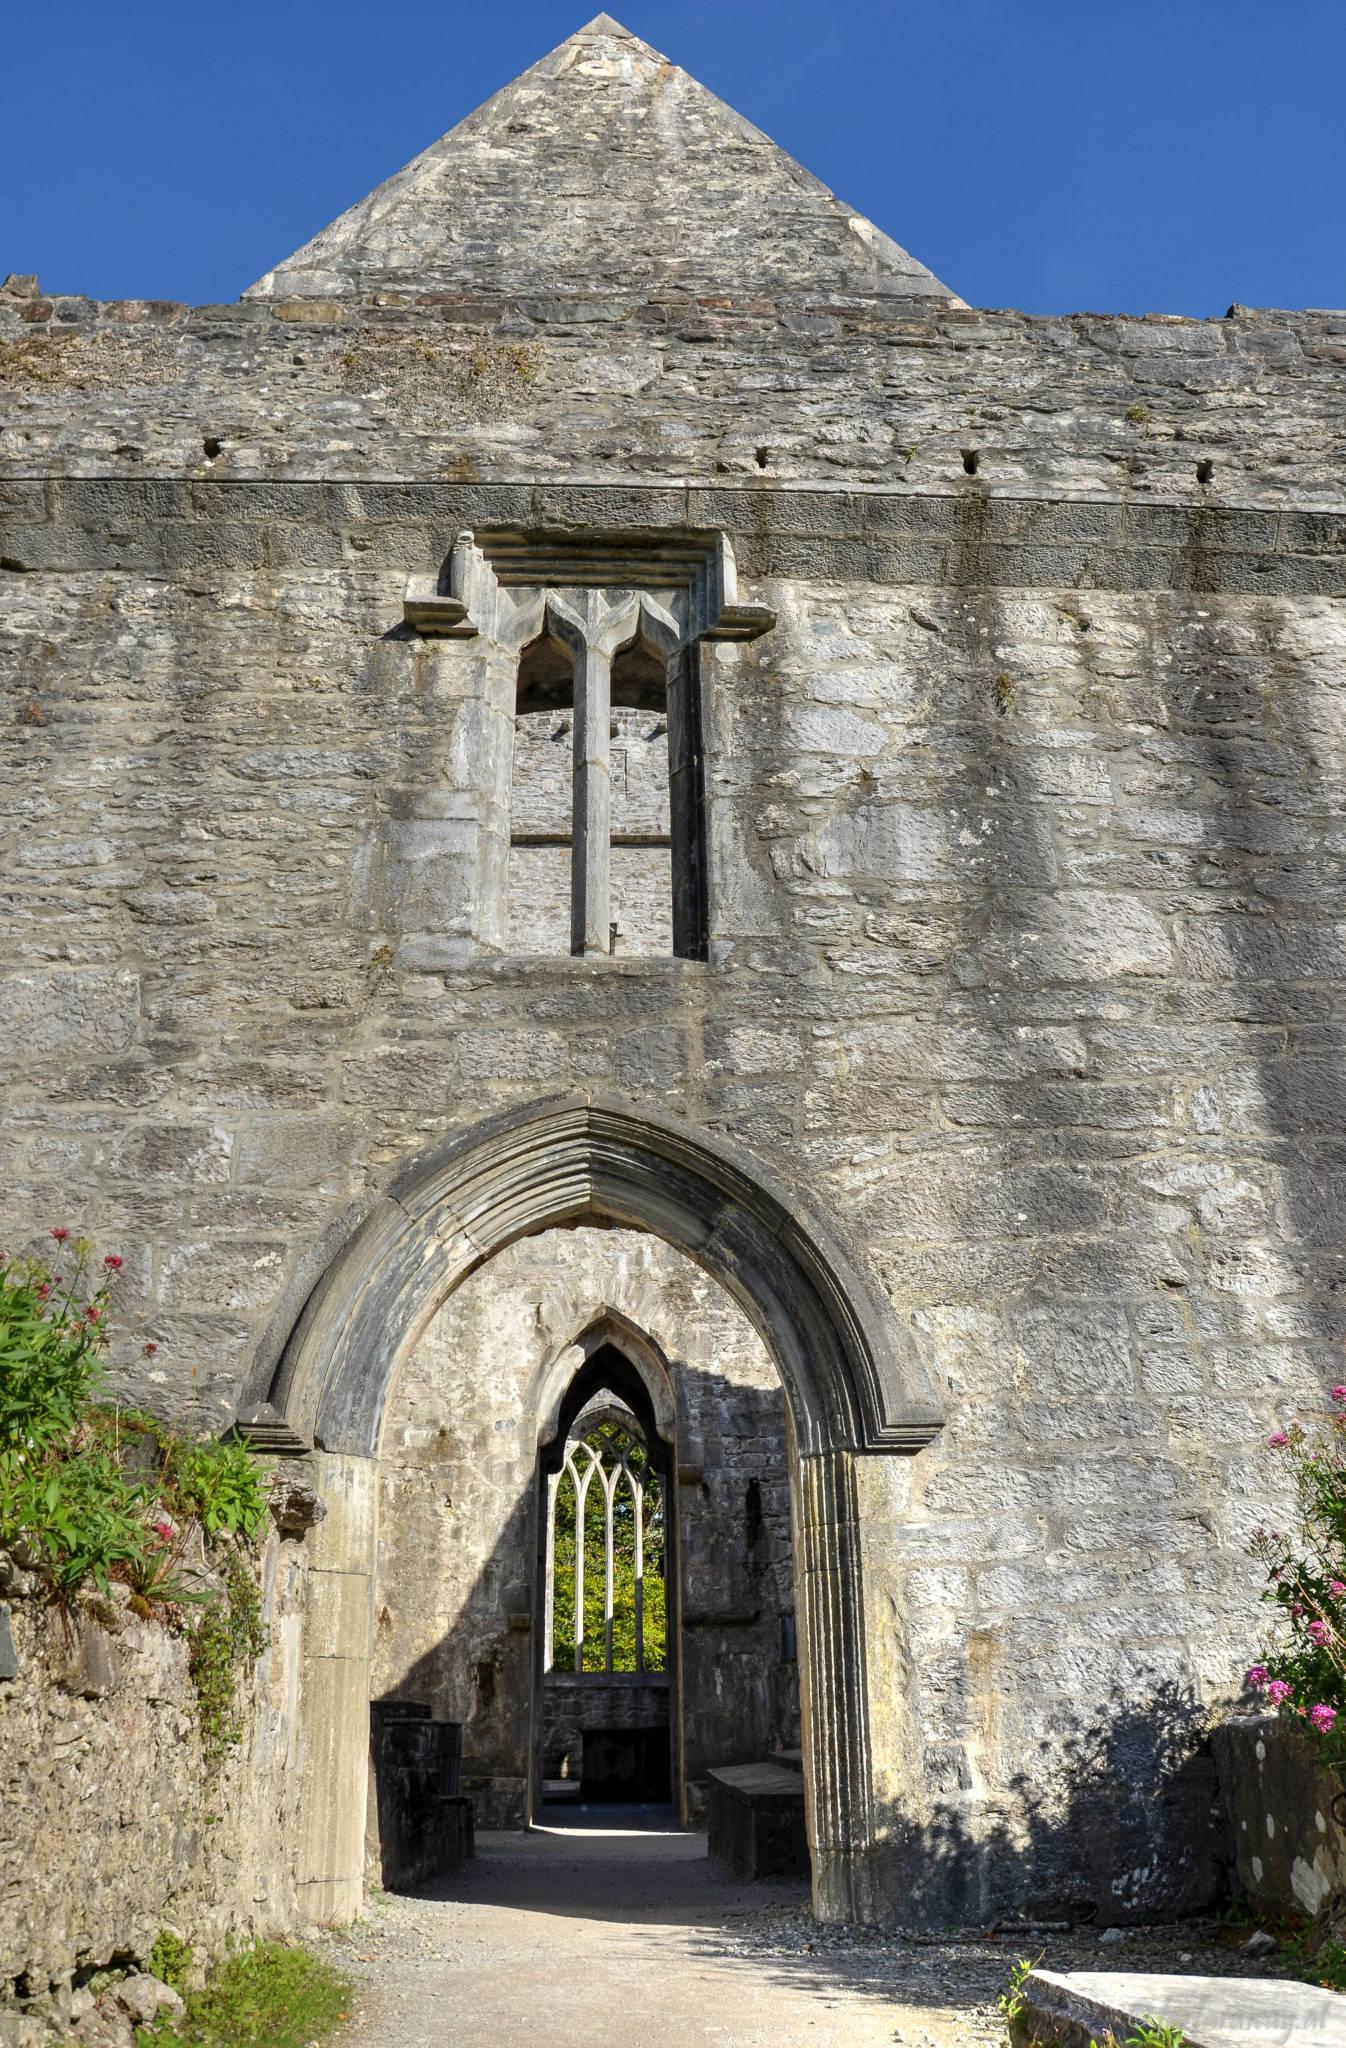 Outside view Muckross Abbey